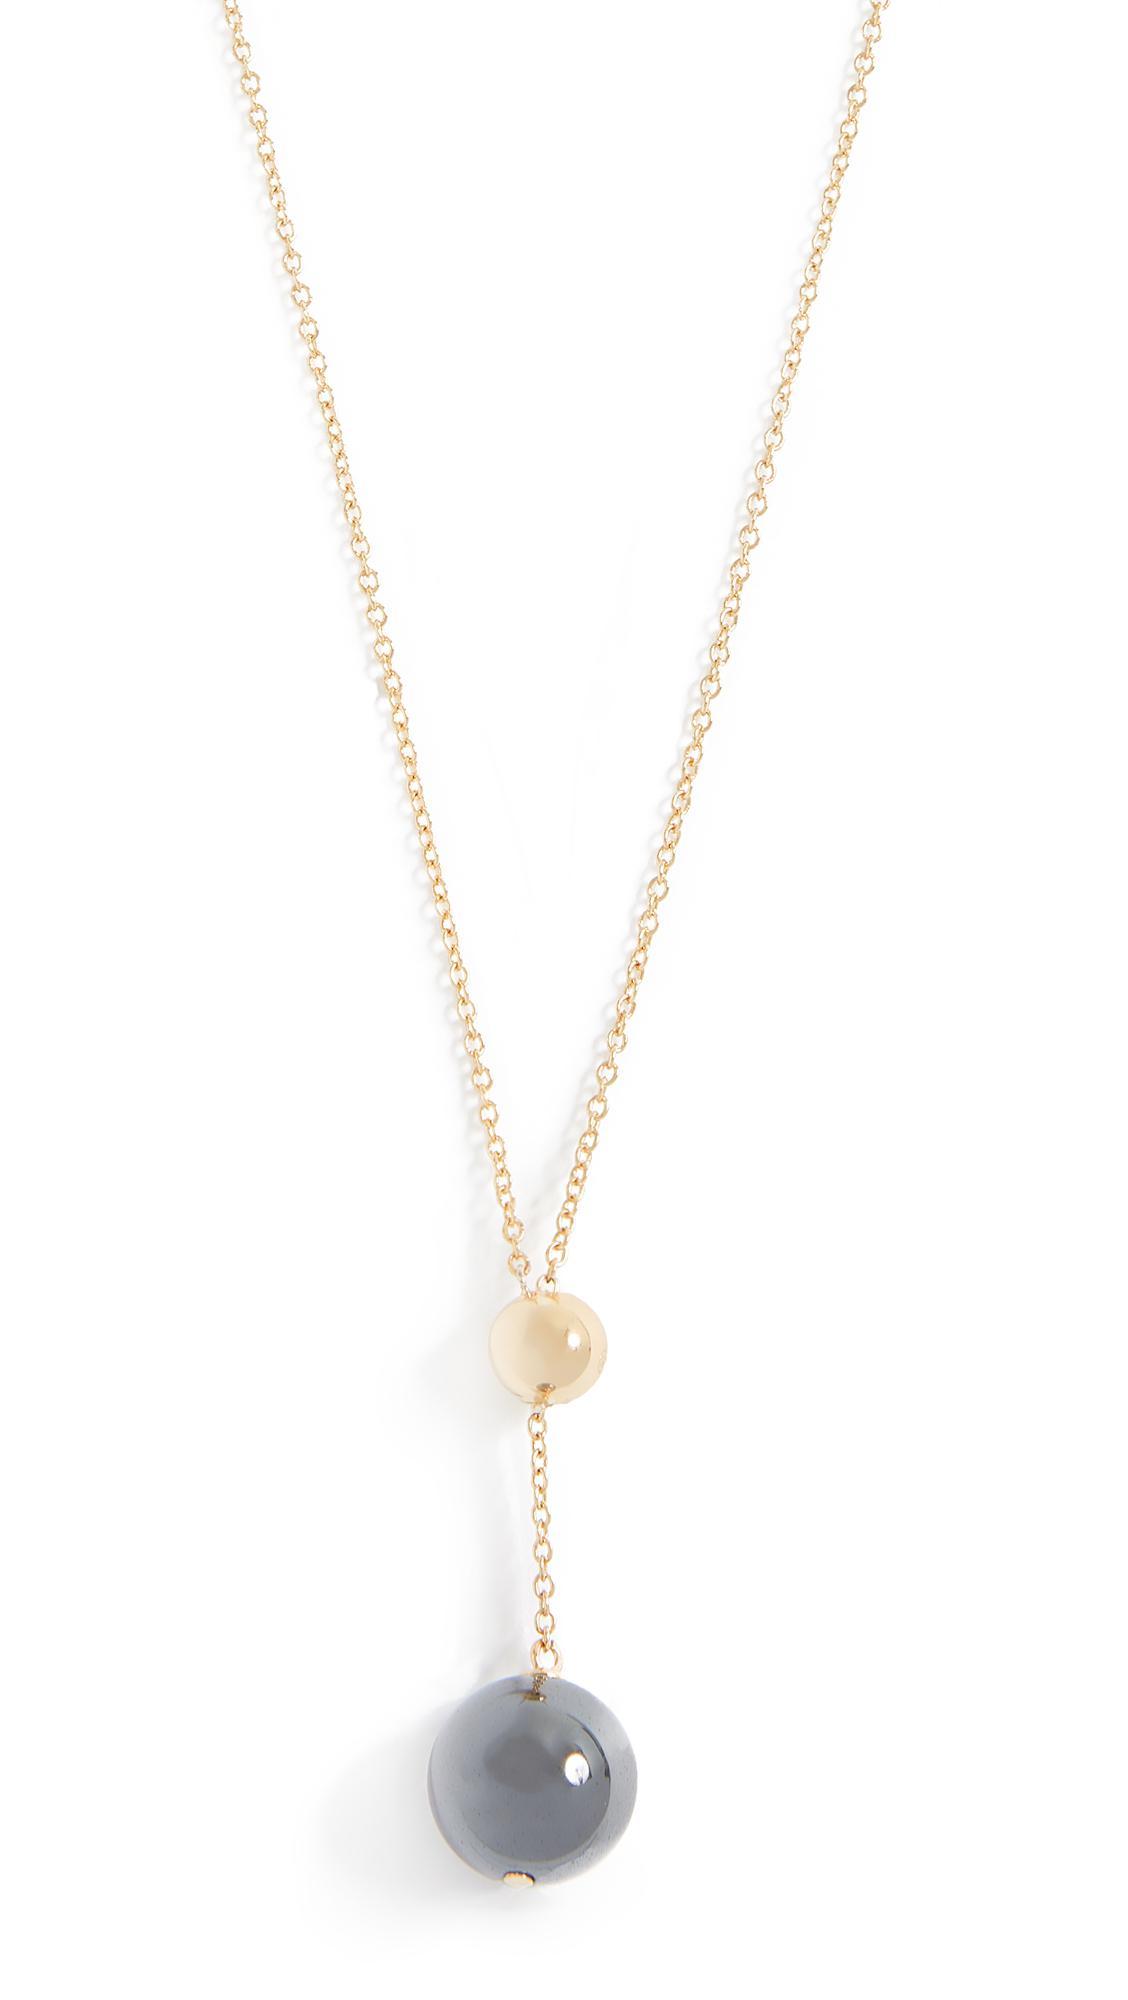 Splendid Gorjana Newport Charm Adjustable Necklace Gold Gold wCZrUbx7OU